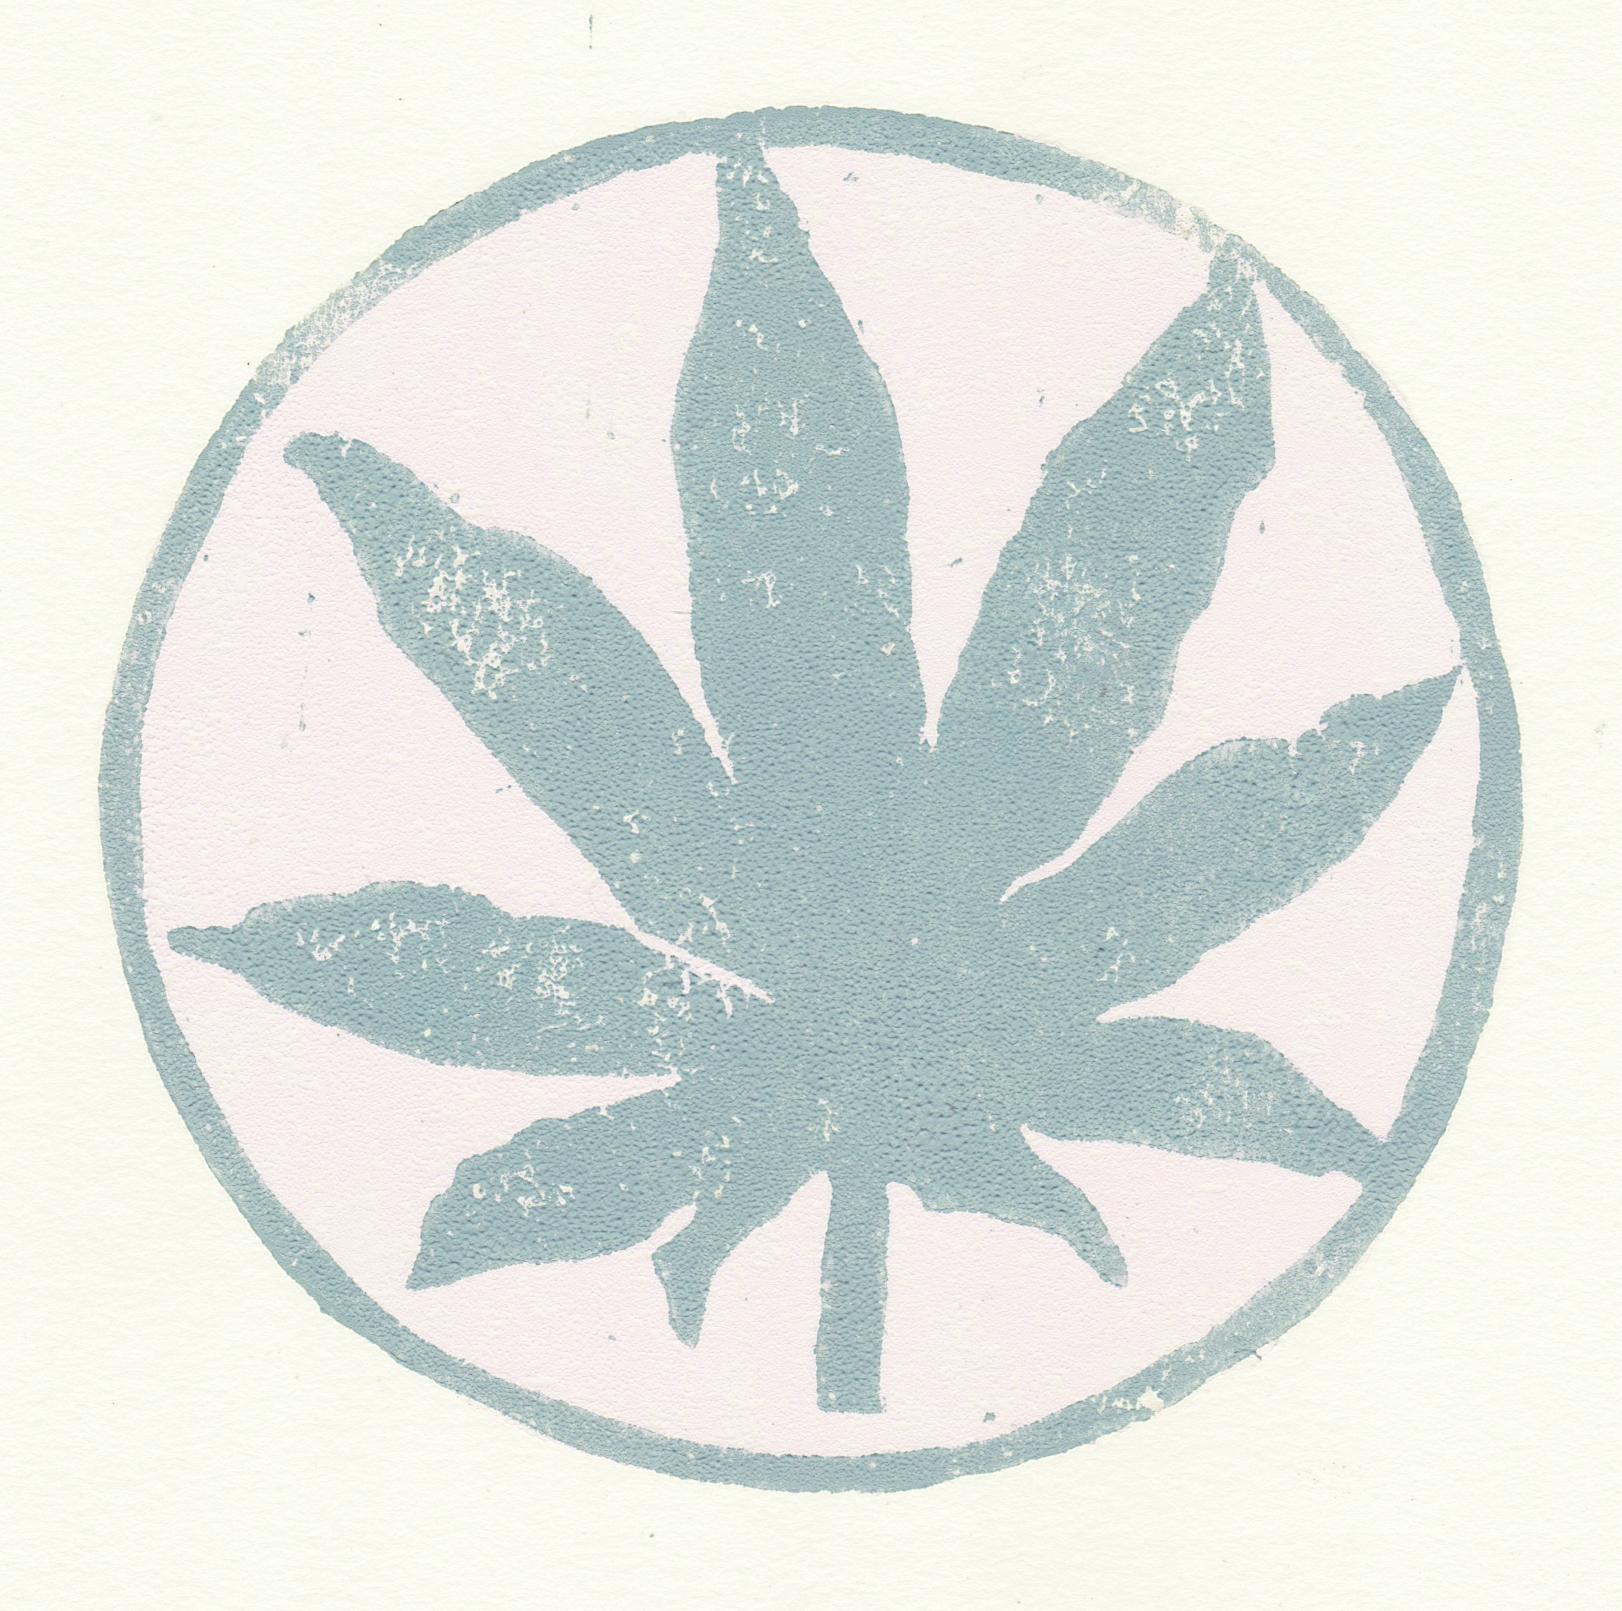 "hemp leaf   woodblock print  edition of 24  4.75x4.75""  2018   purchase"